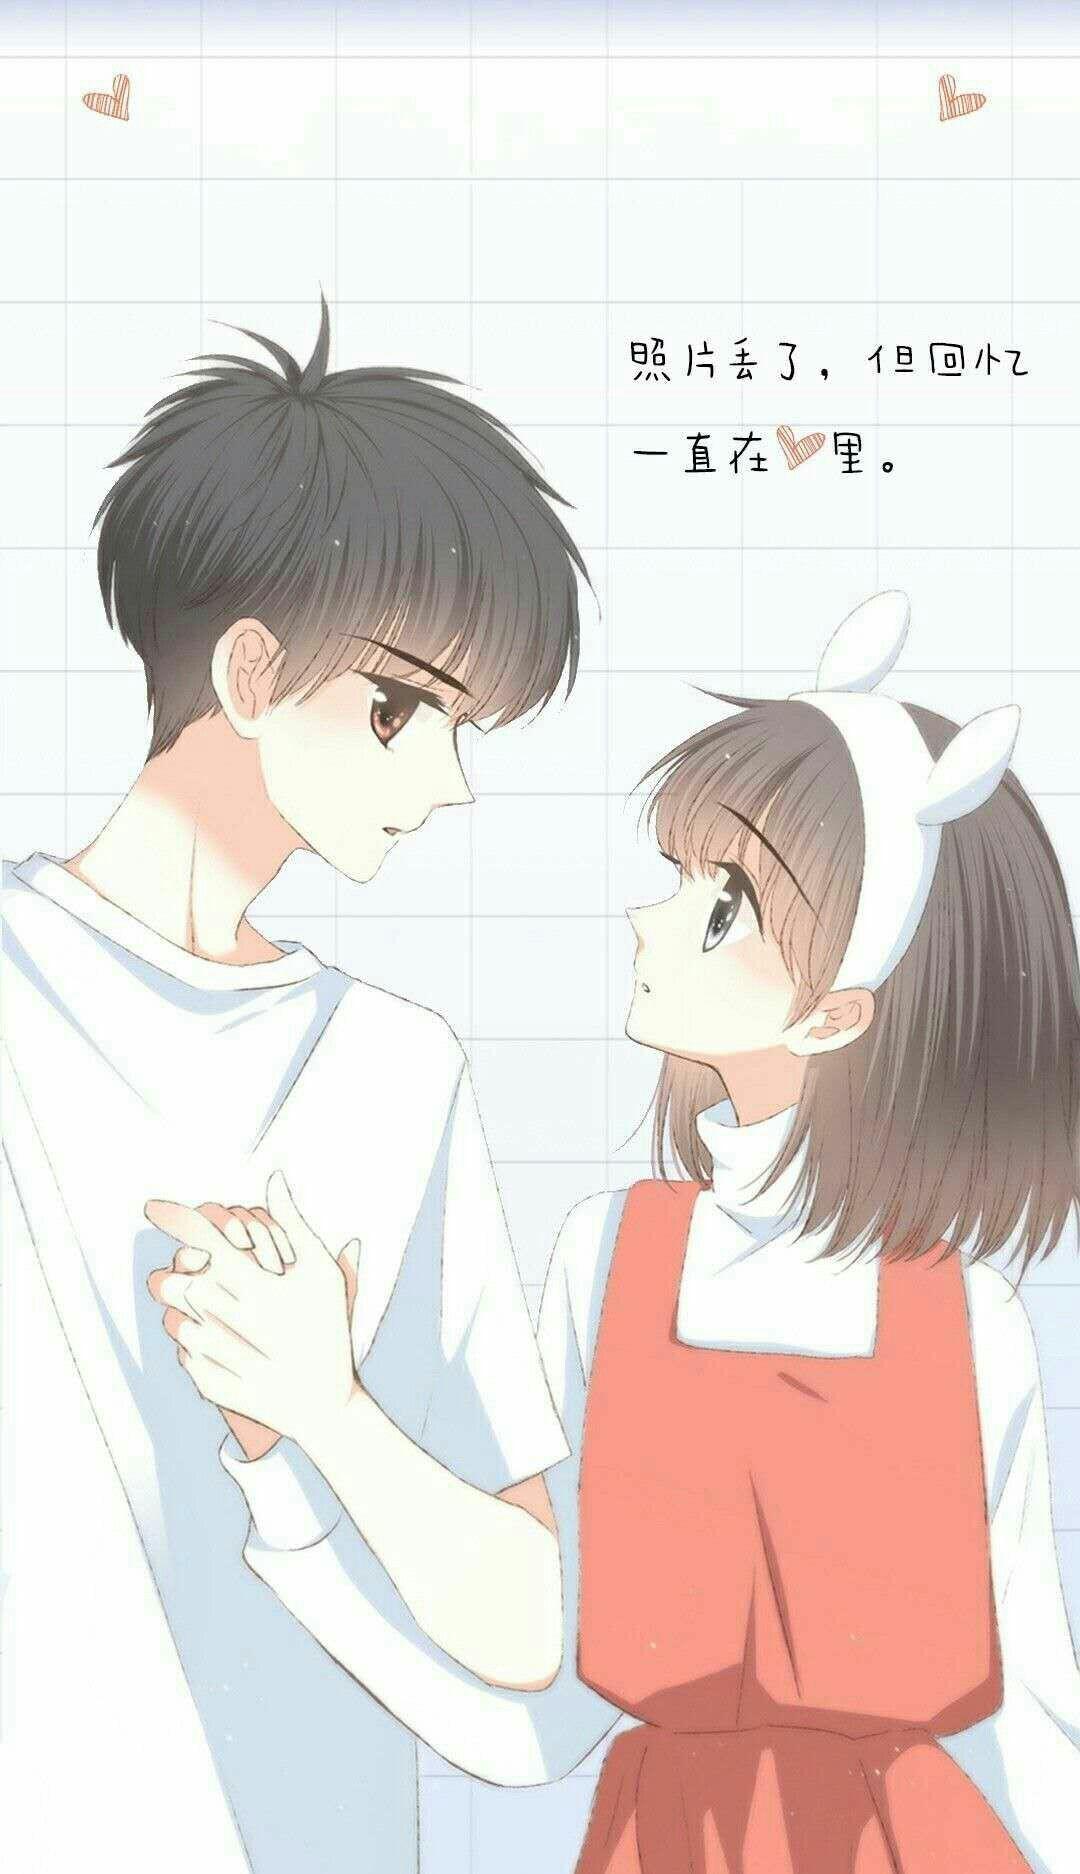 Pin oleh Pearl Lam di 漫画 (Dengan gambar) Gambar anime